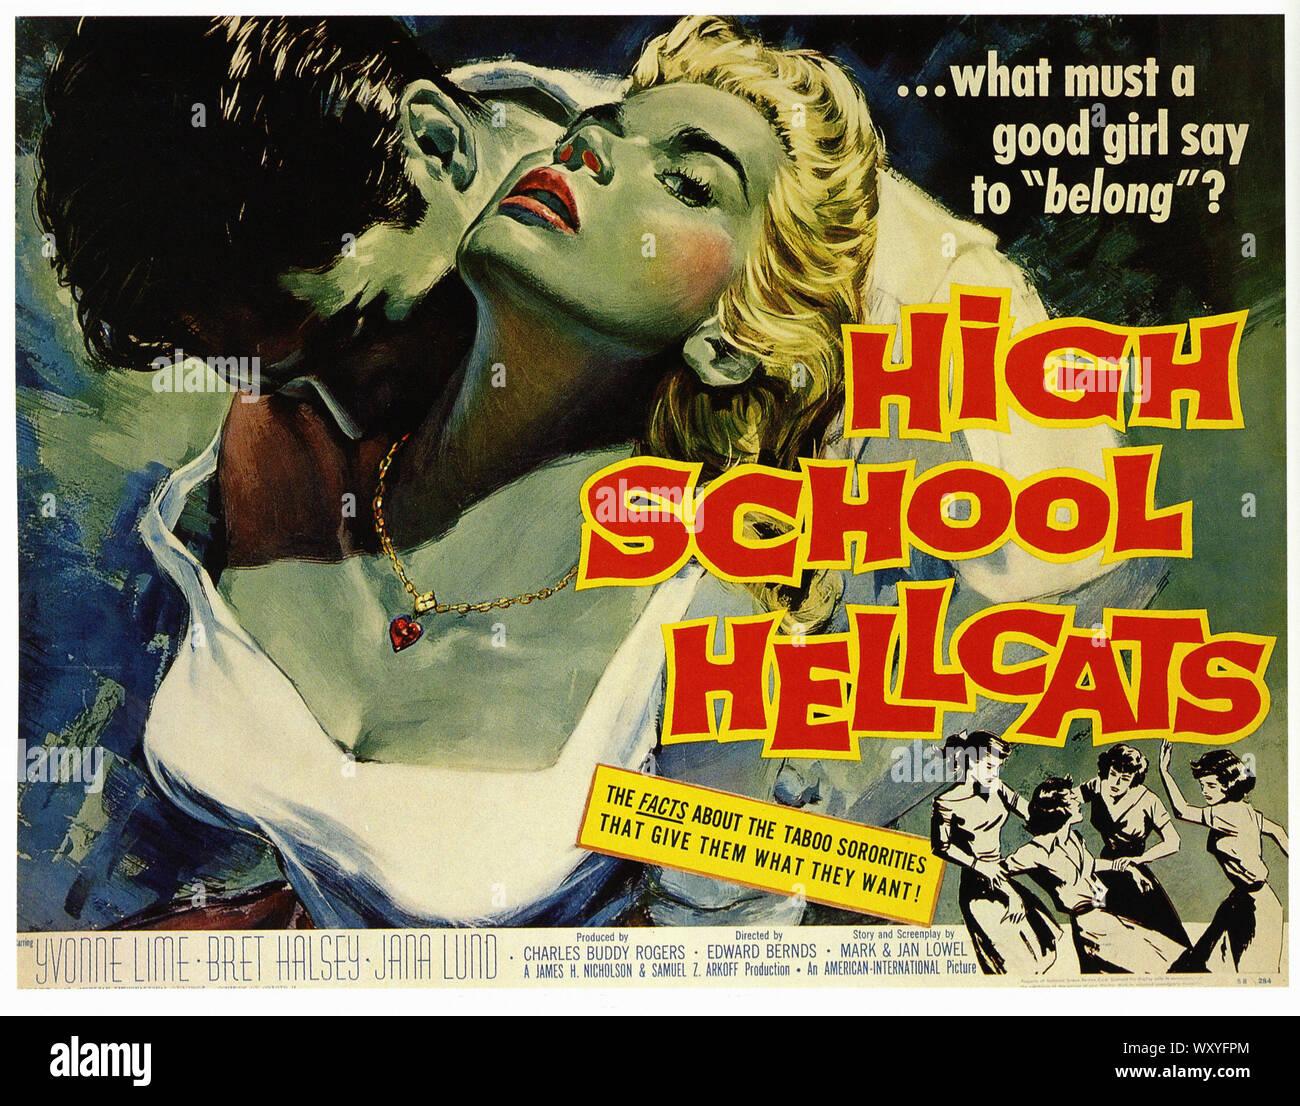 American Taboo Movie high school hellcats - vintage movie poster stock photo